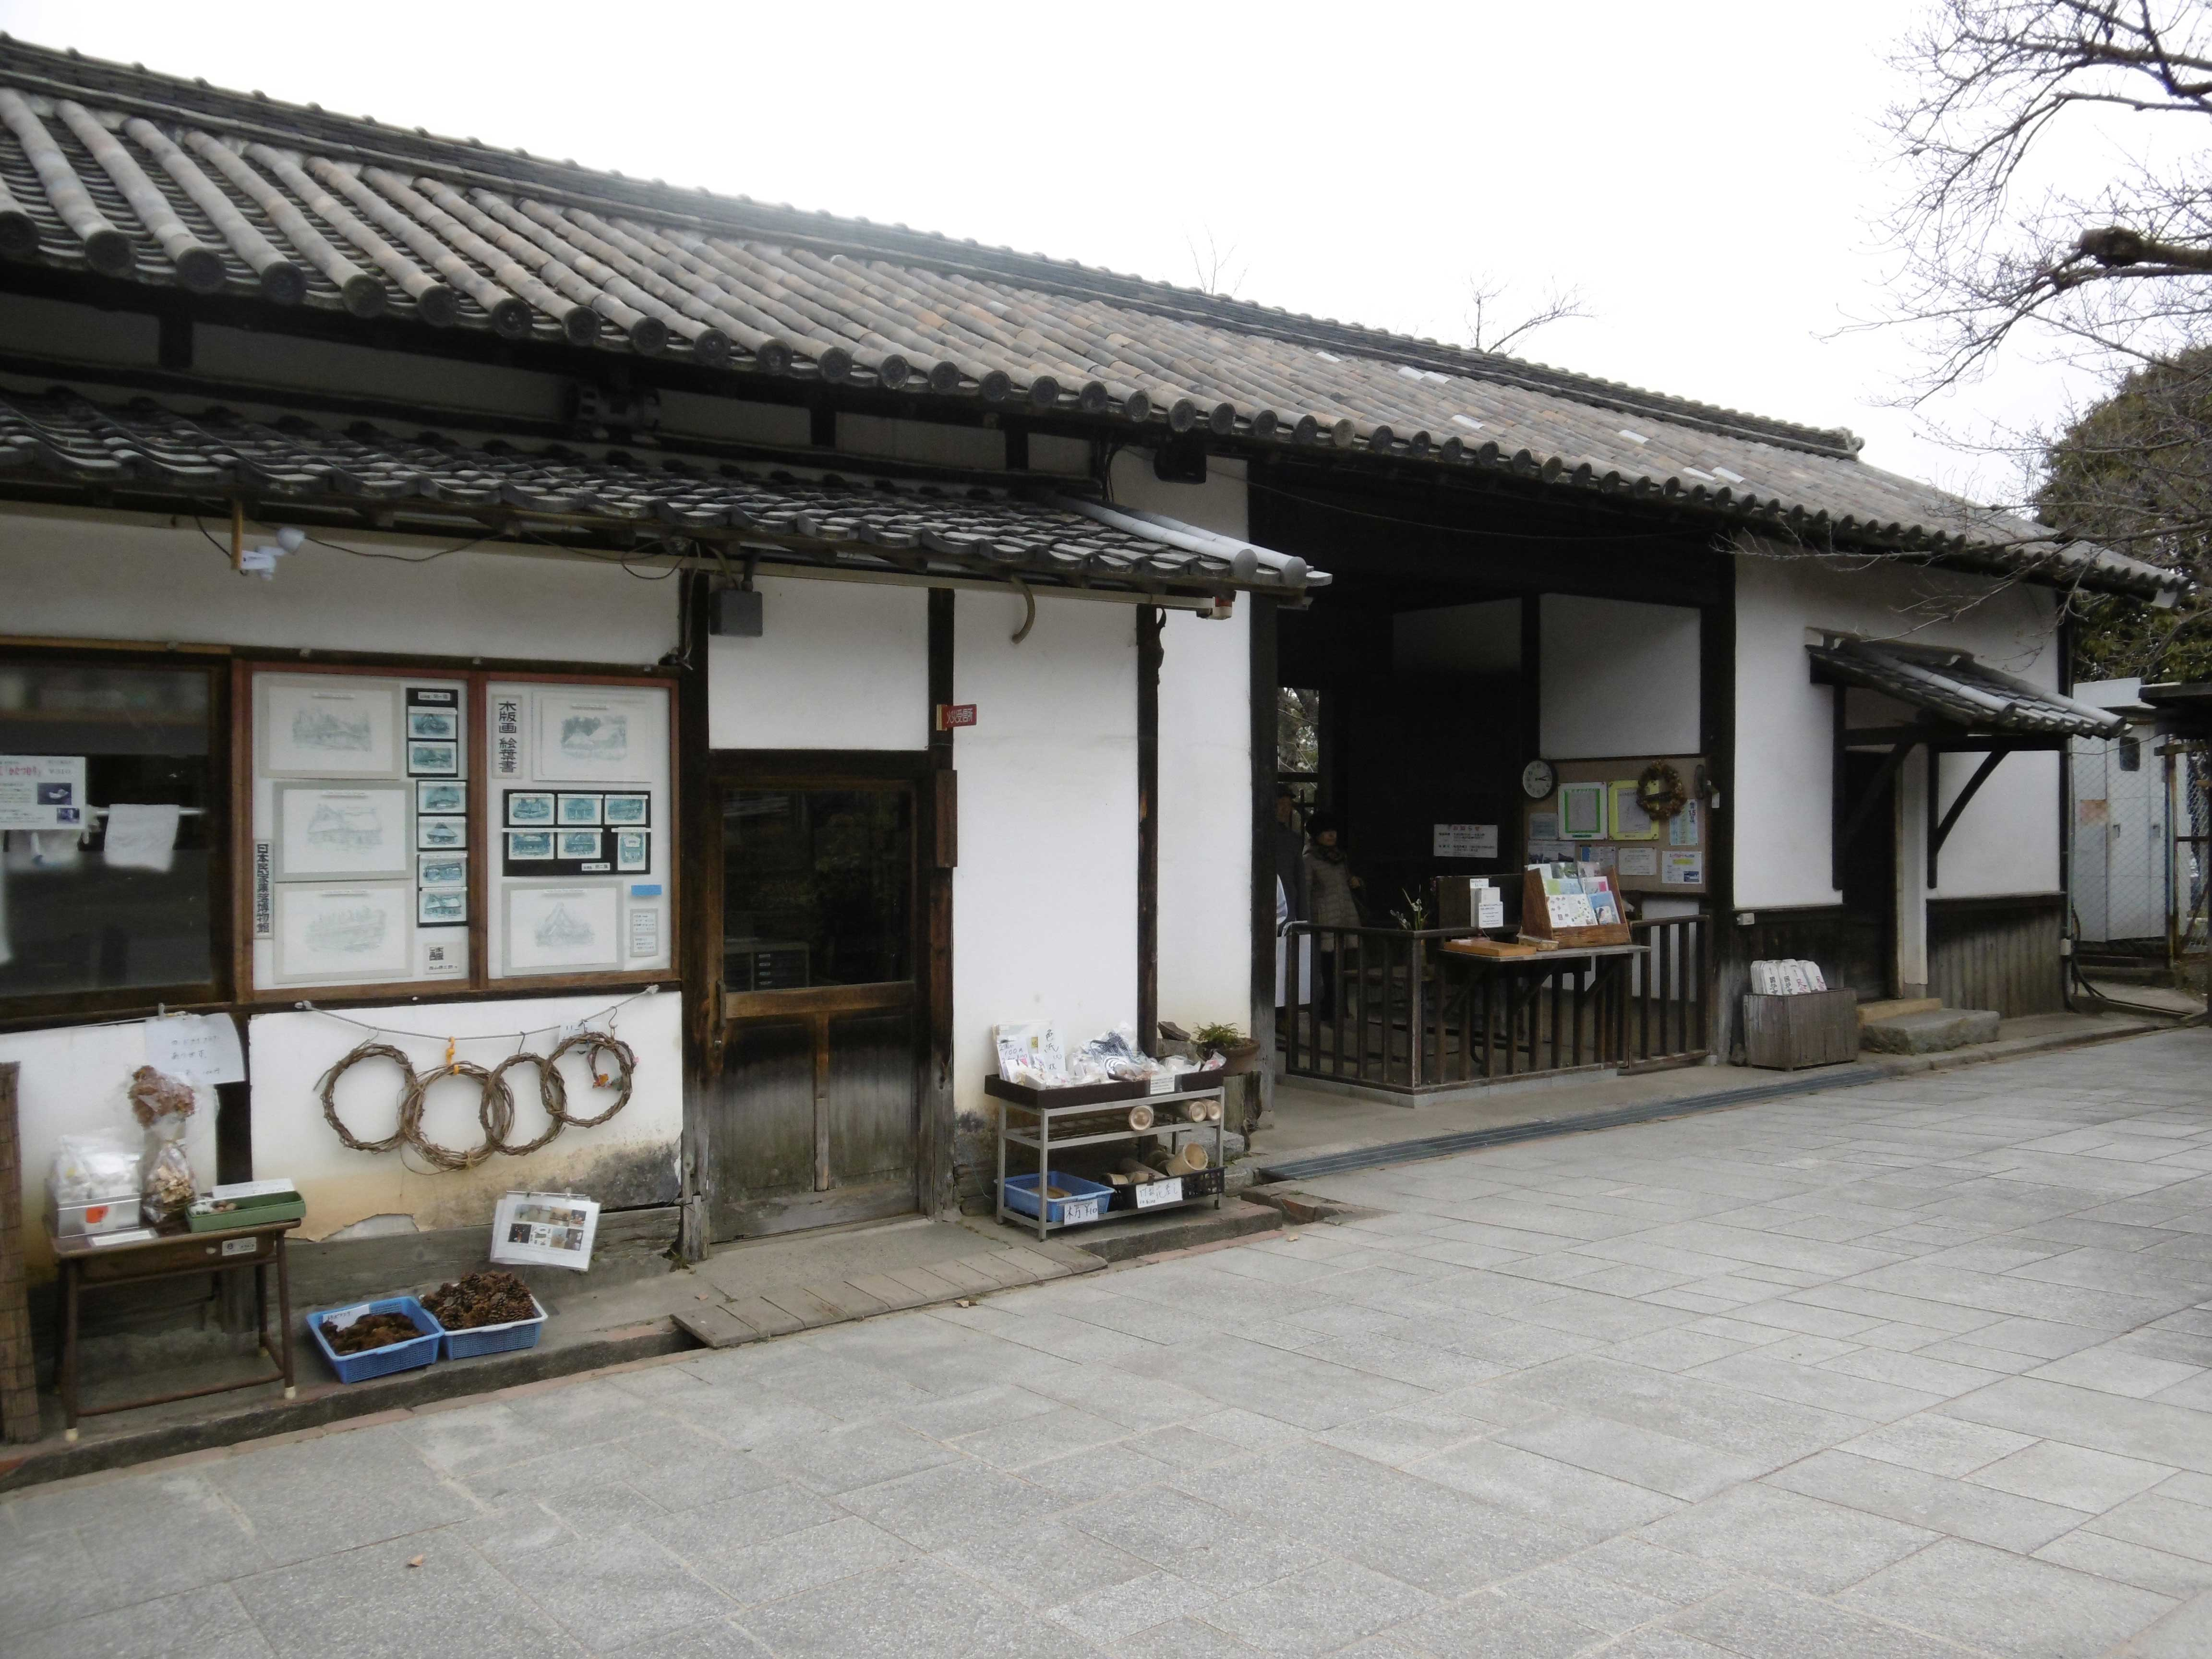 <p>裏面外観</p>手前(左)側が事務室(元供部屋)で、向う(右)側が土蔵部分